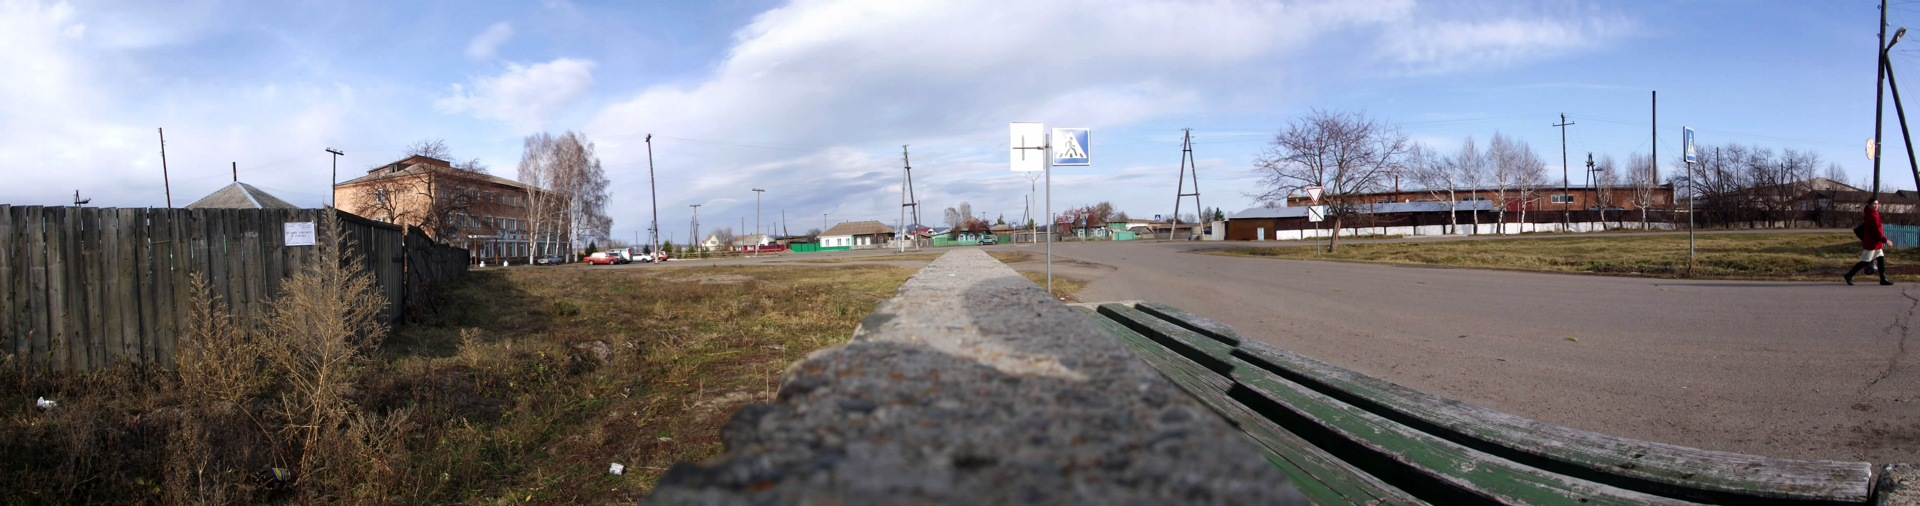 Село каратузское красноярского края фото